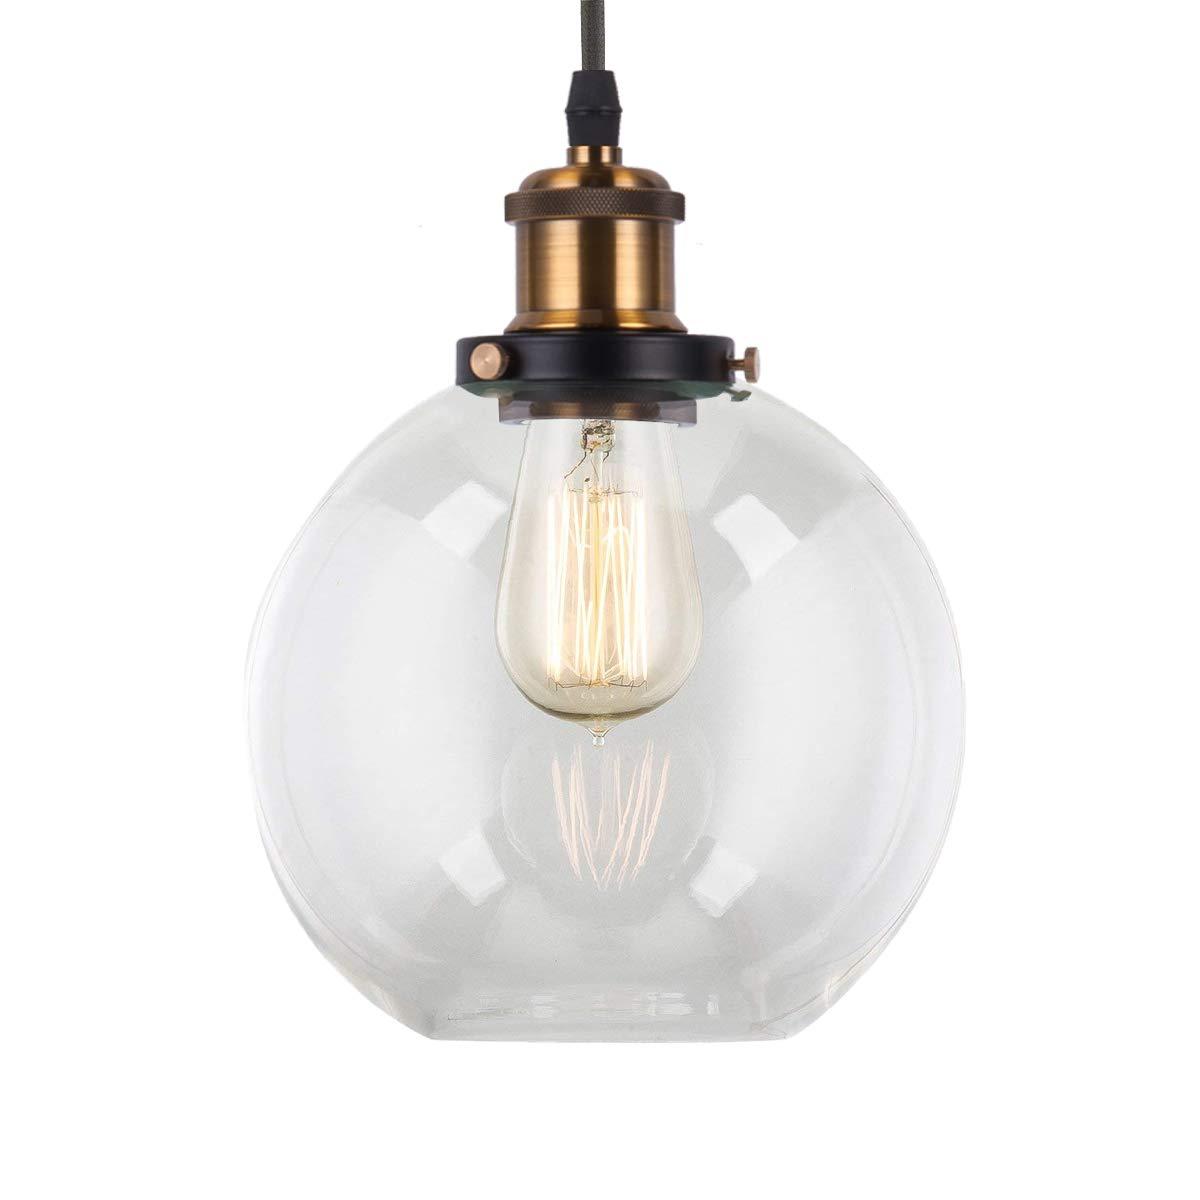 Lightingpro Industrial Globe Pendant Lighting With 8 Hand Blown